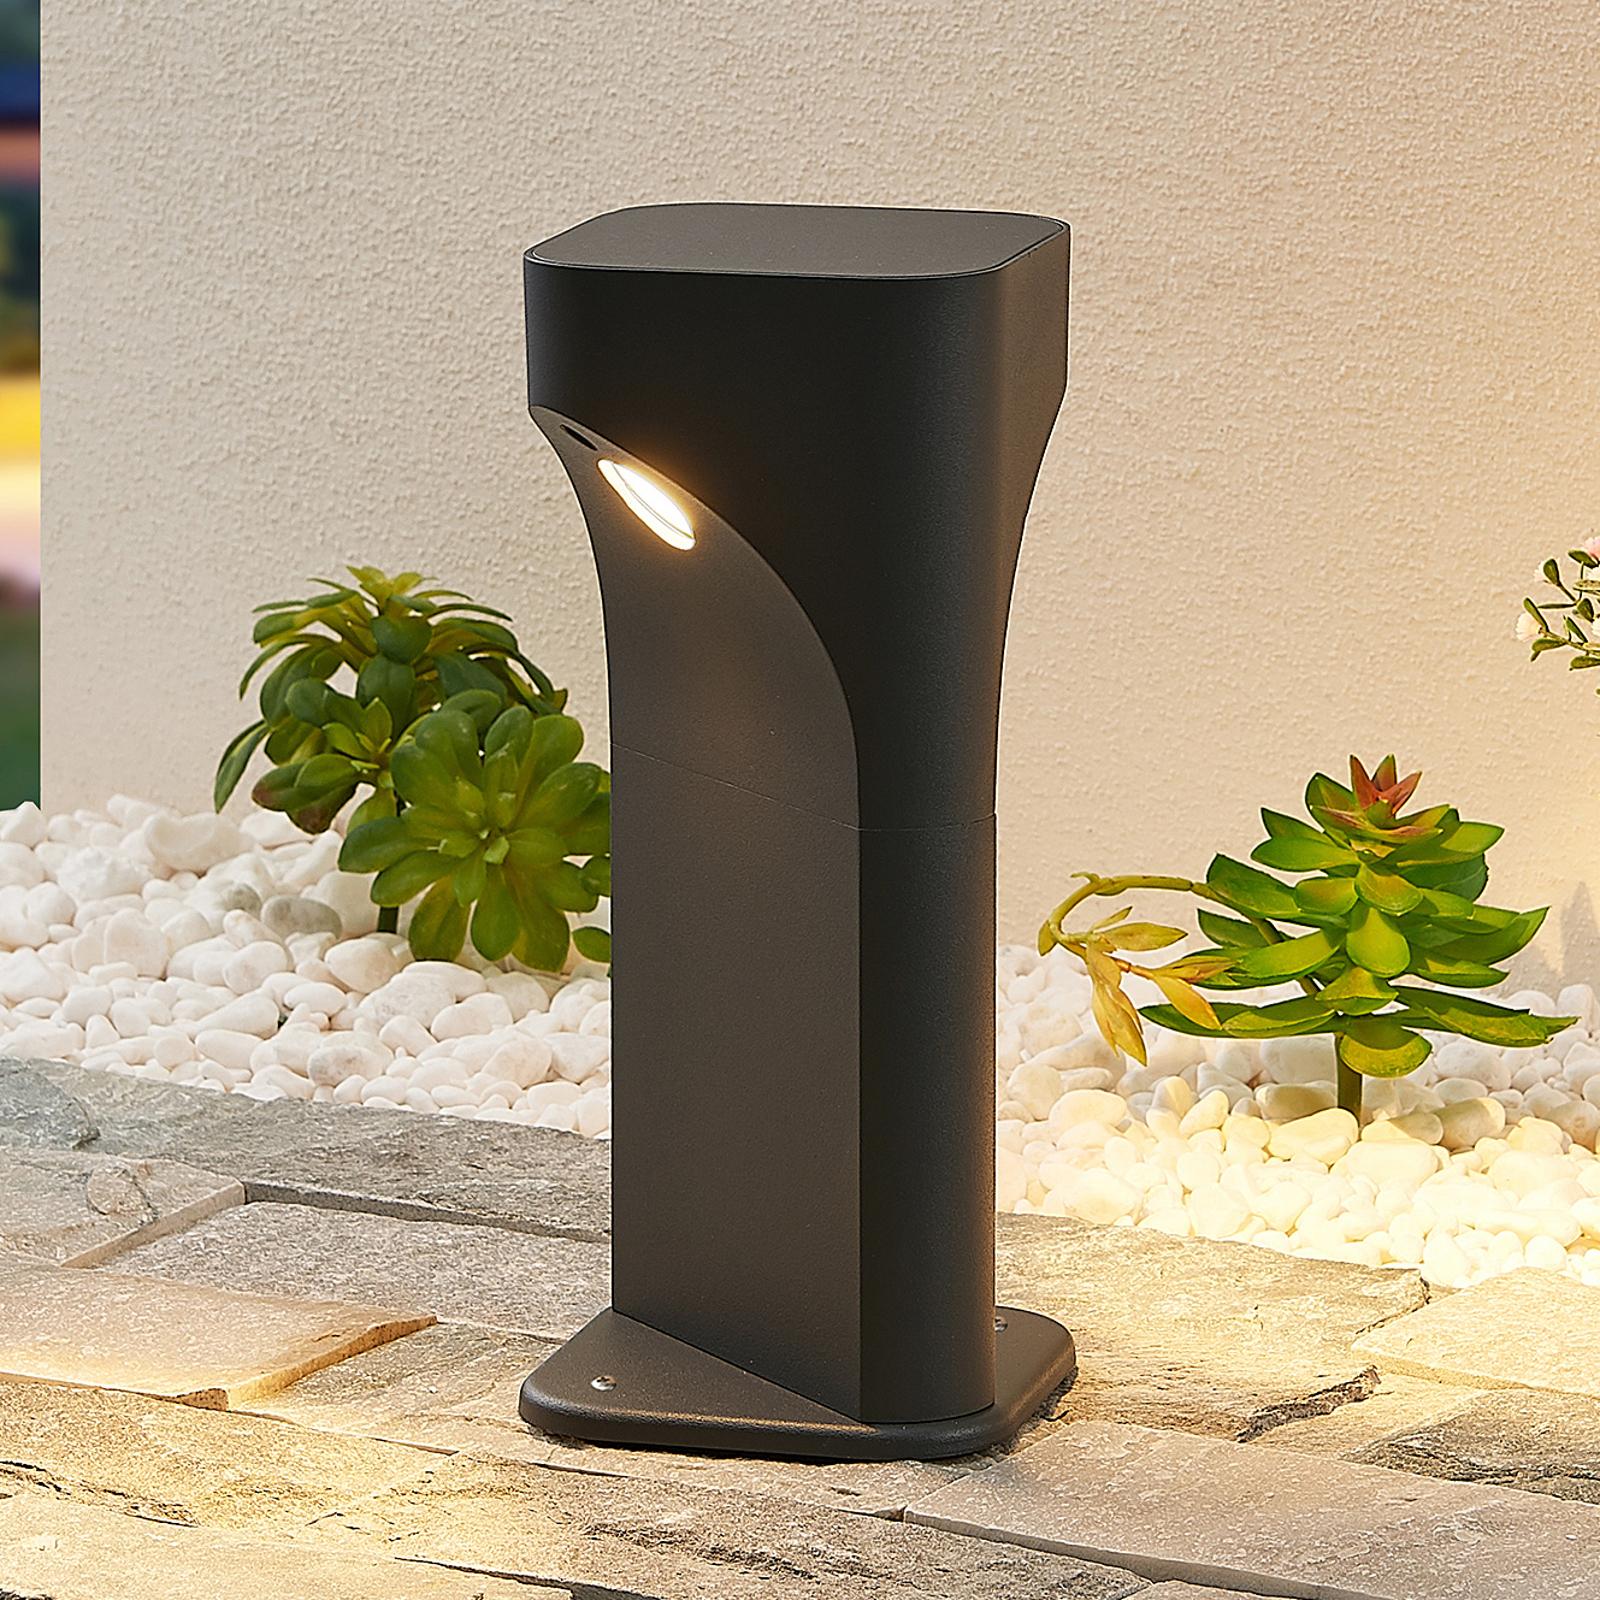 Lucande Valdeta lampa cokołowa LED, wysokość 30 cm